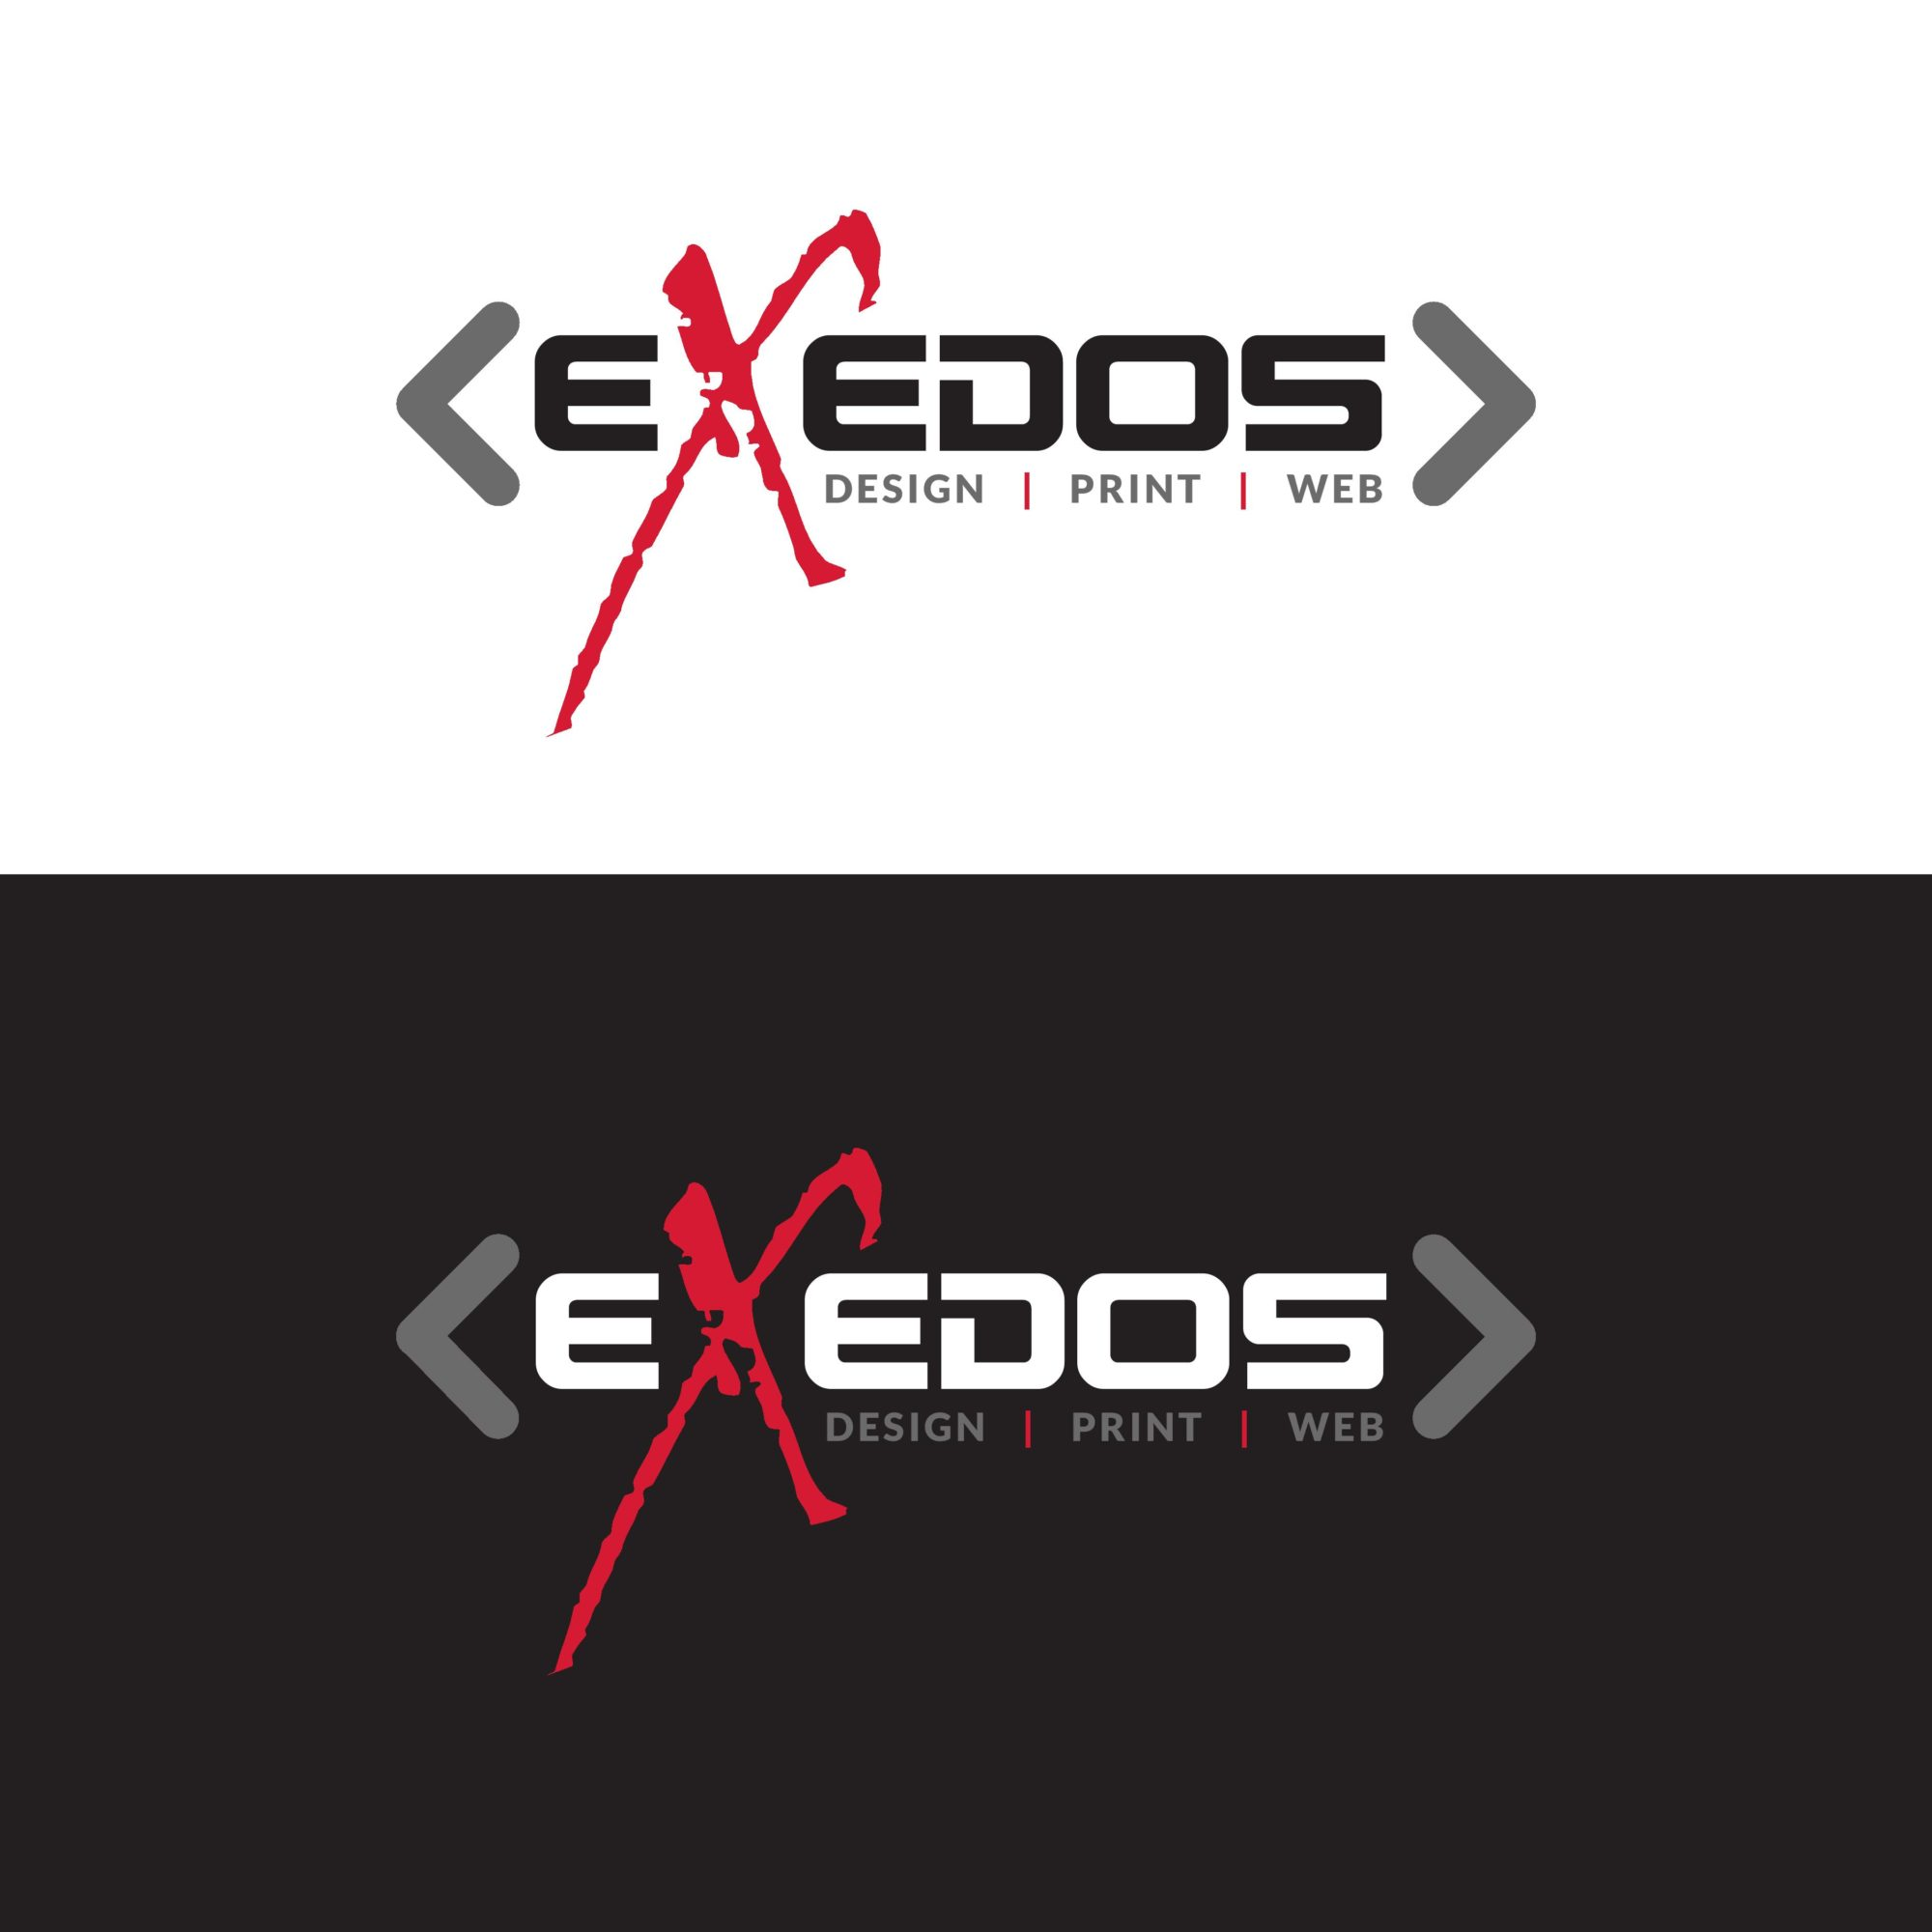 Logo Exedos-page-001